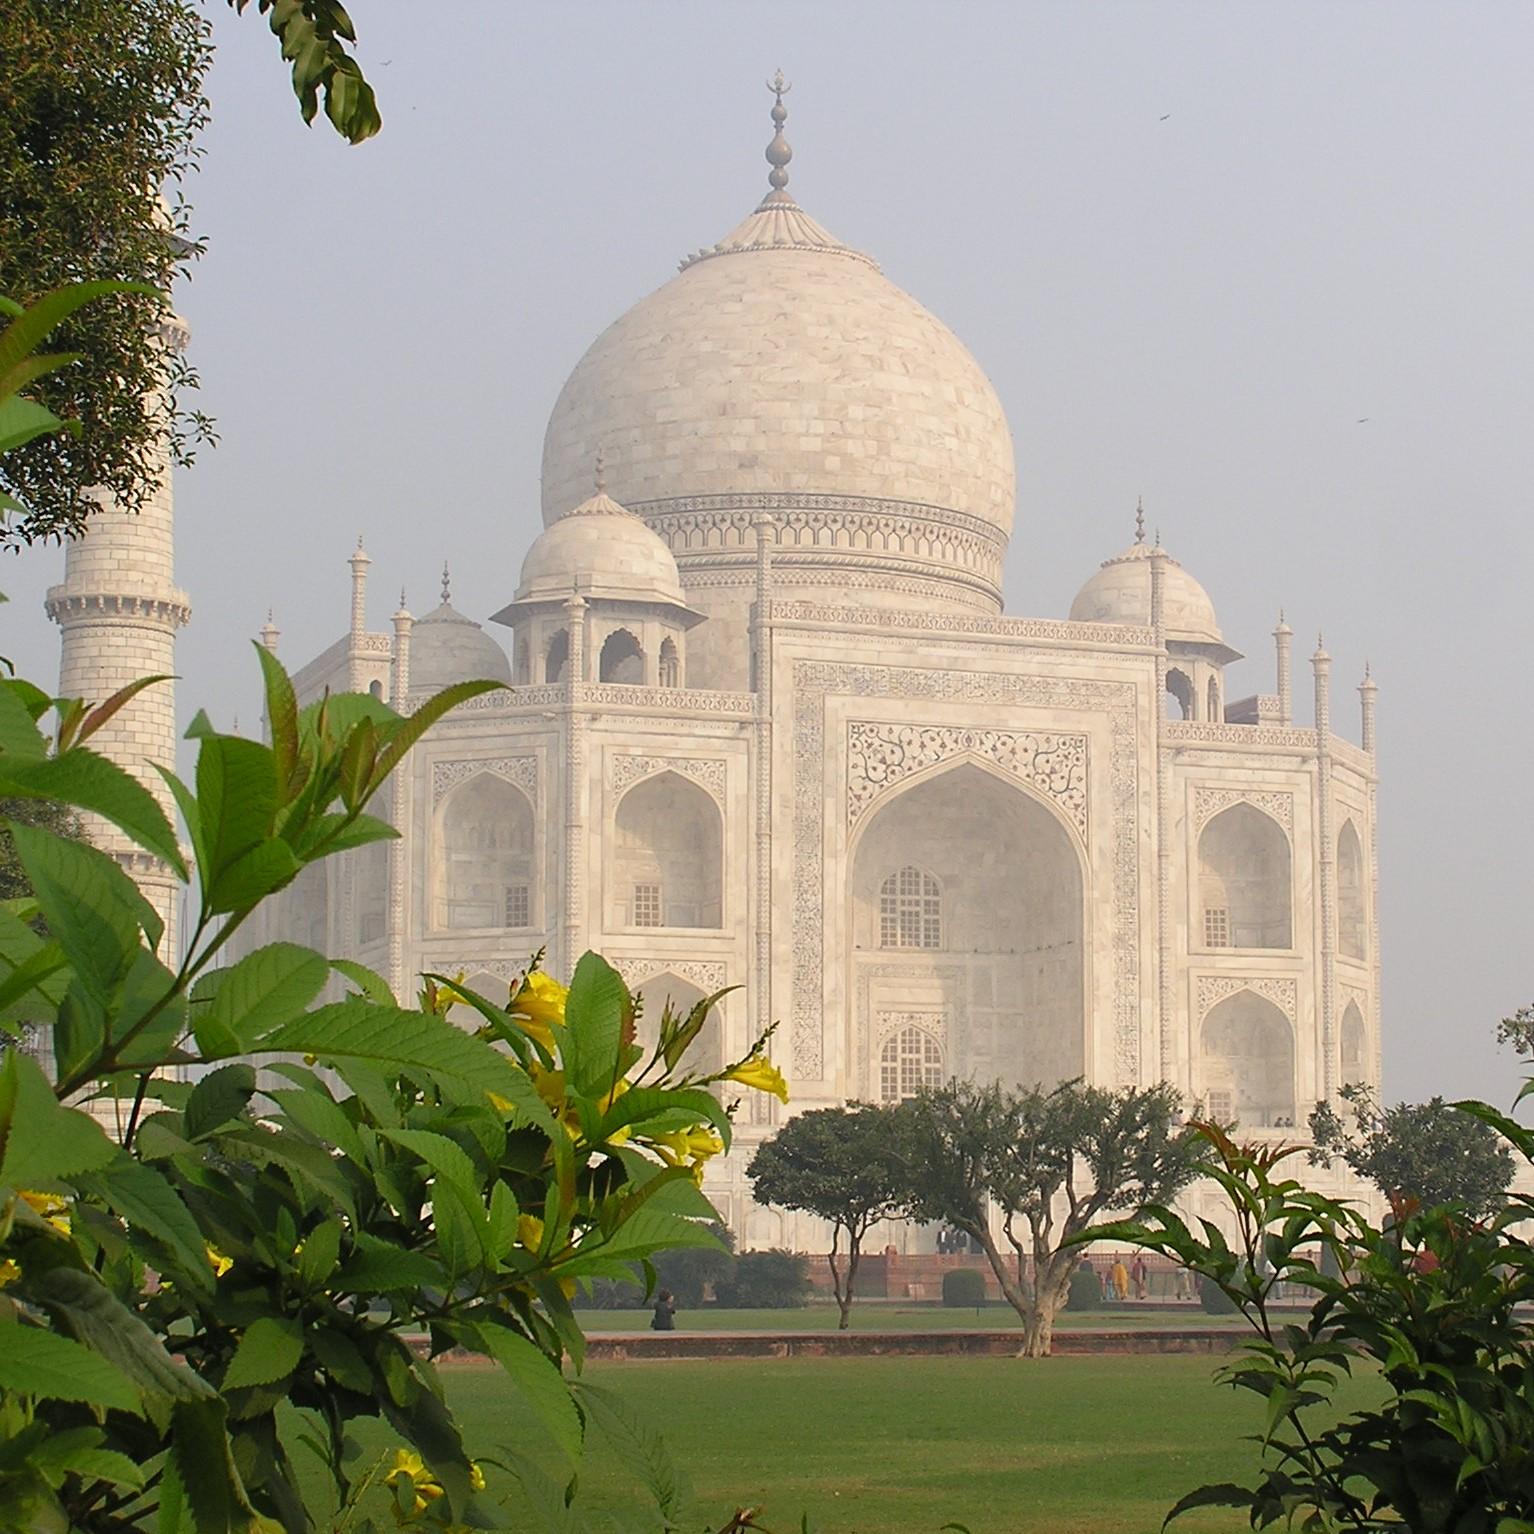 Noord-India foto Taj Mahal